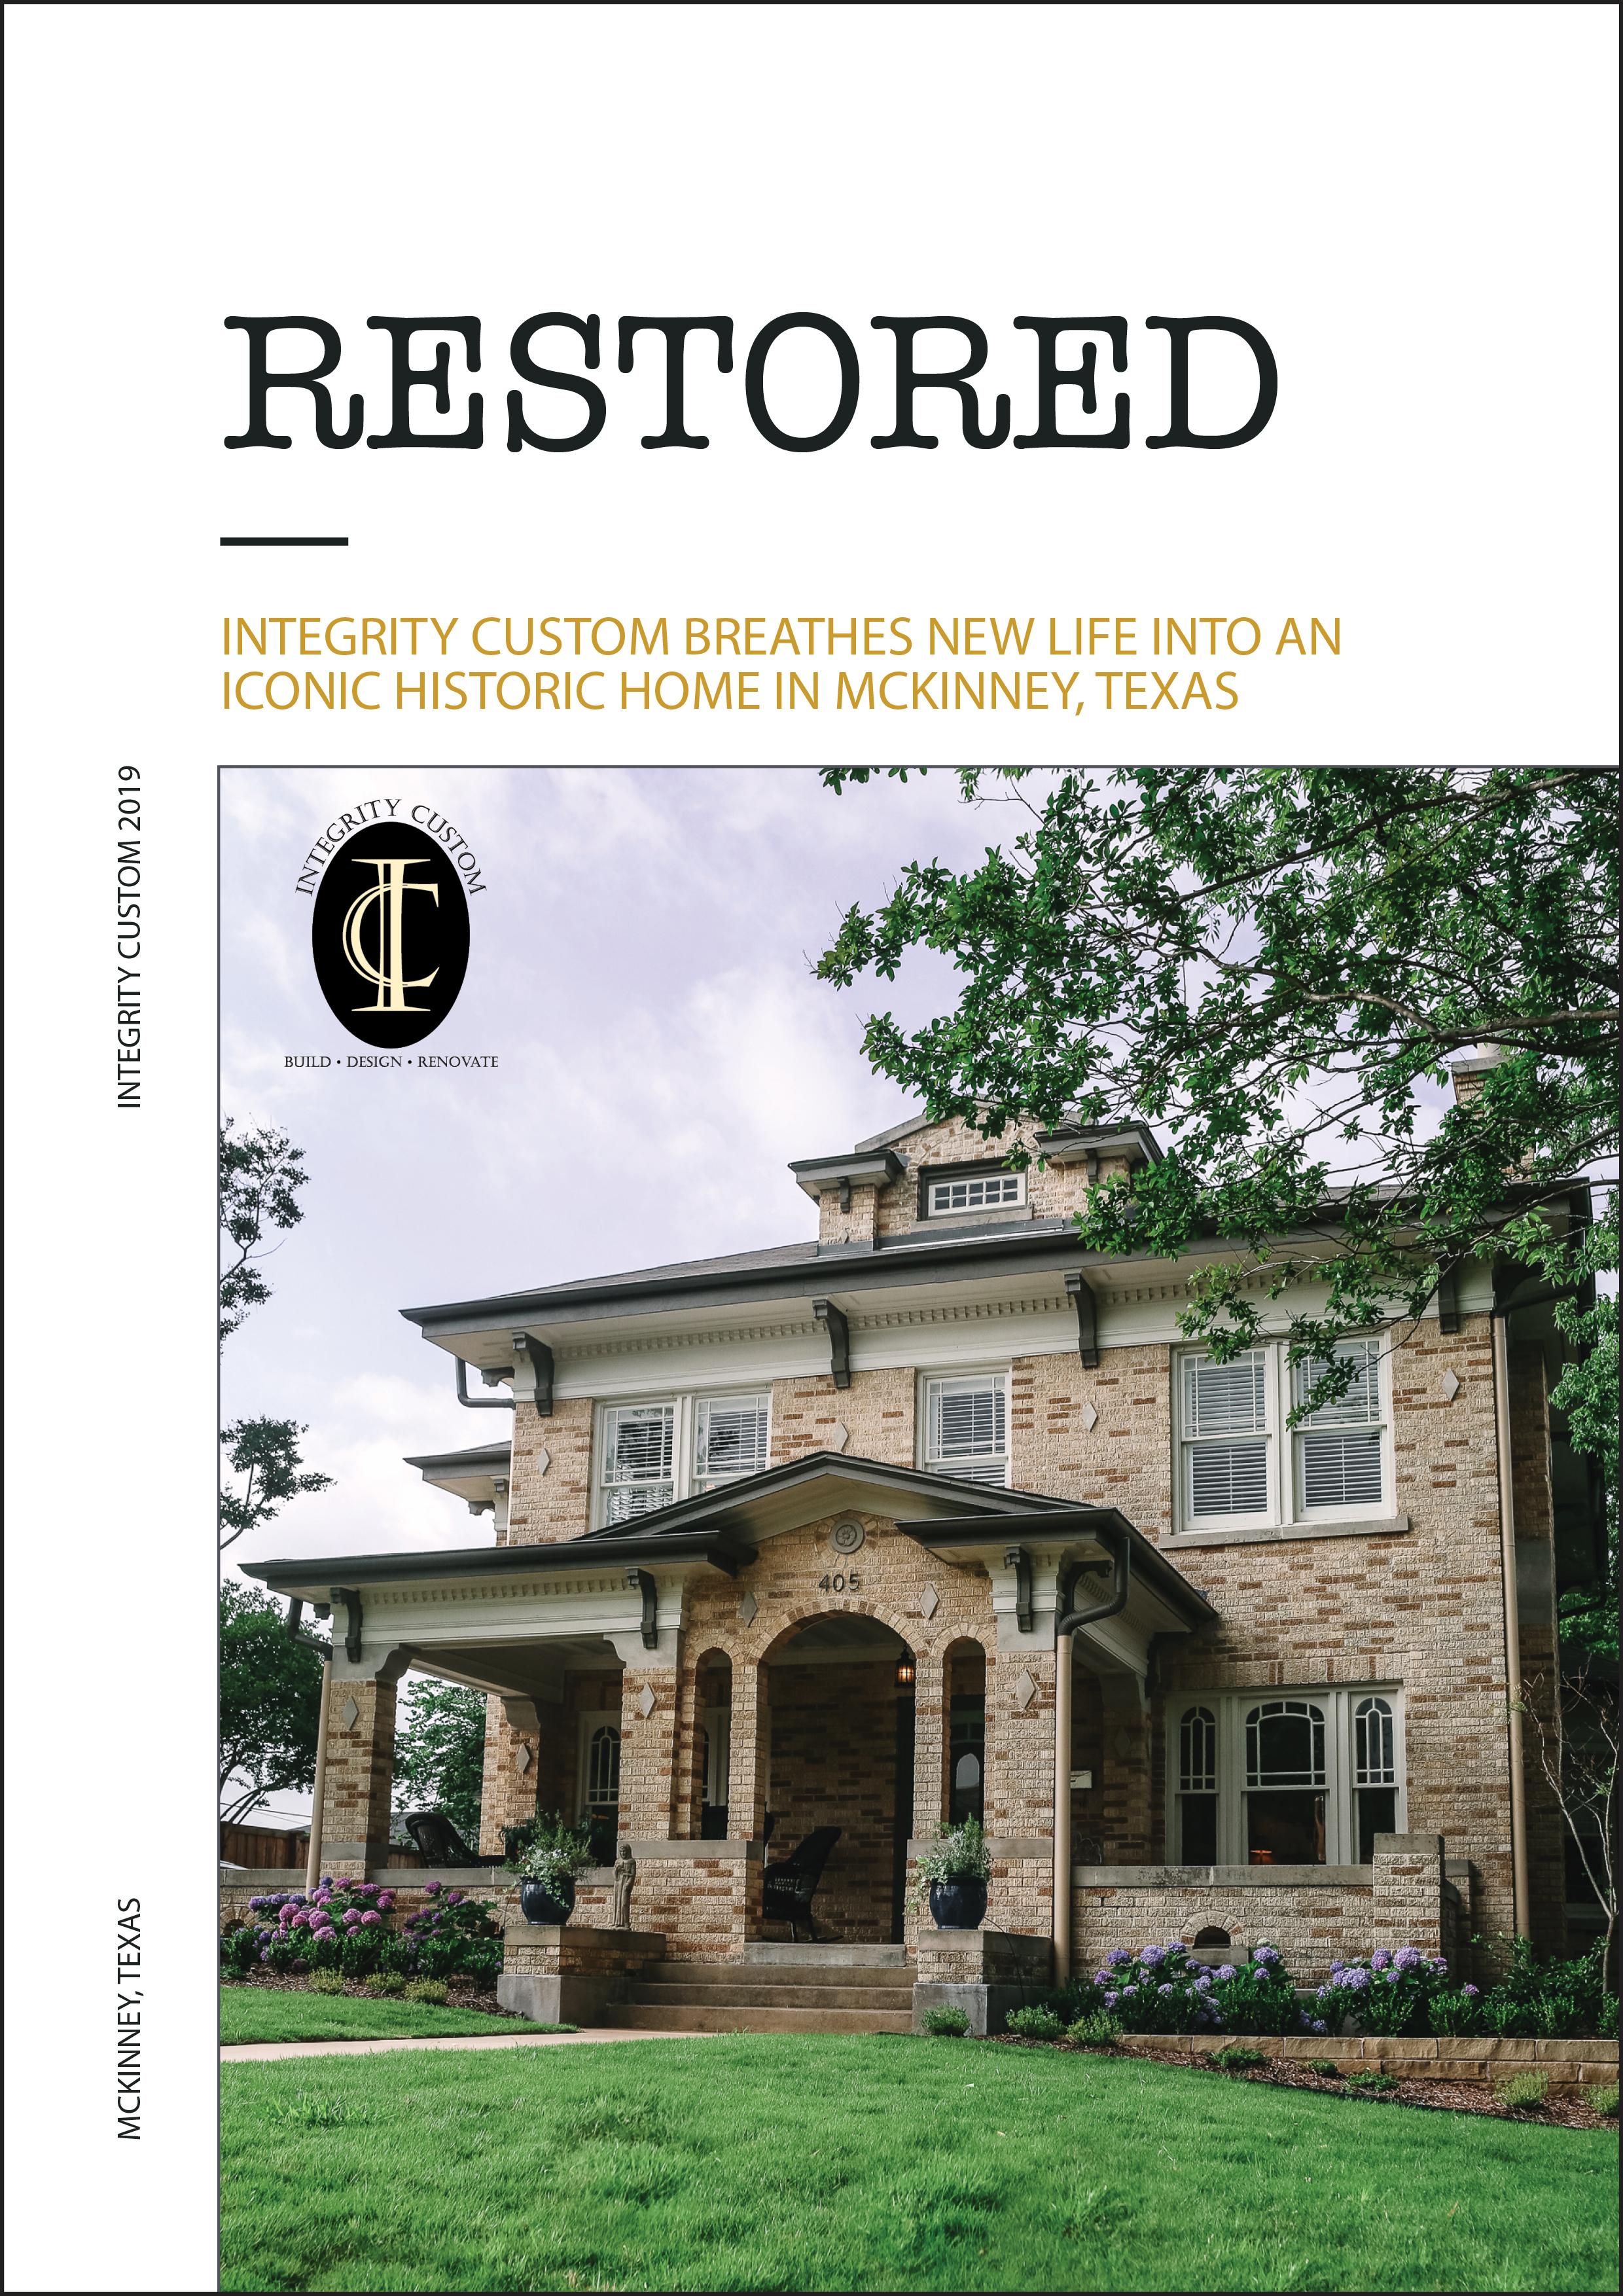 RESTORED Magazine.jpg